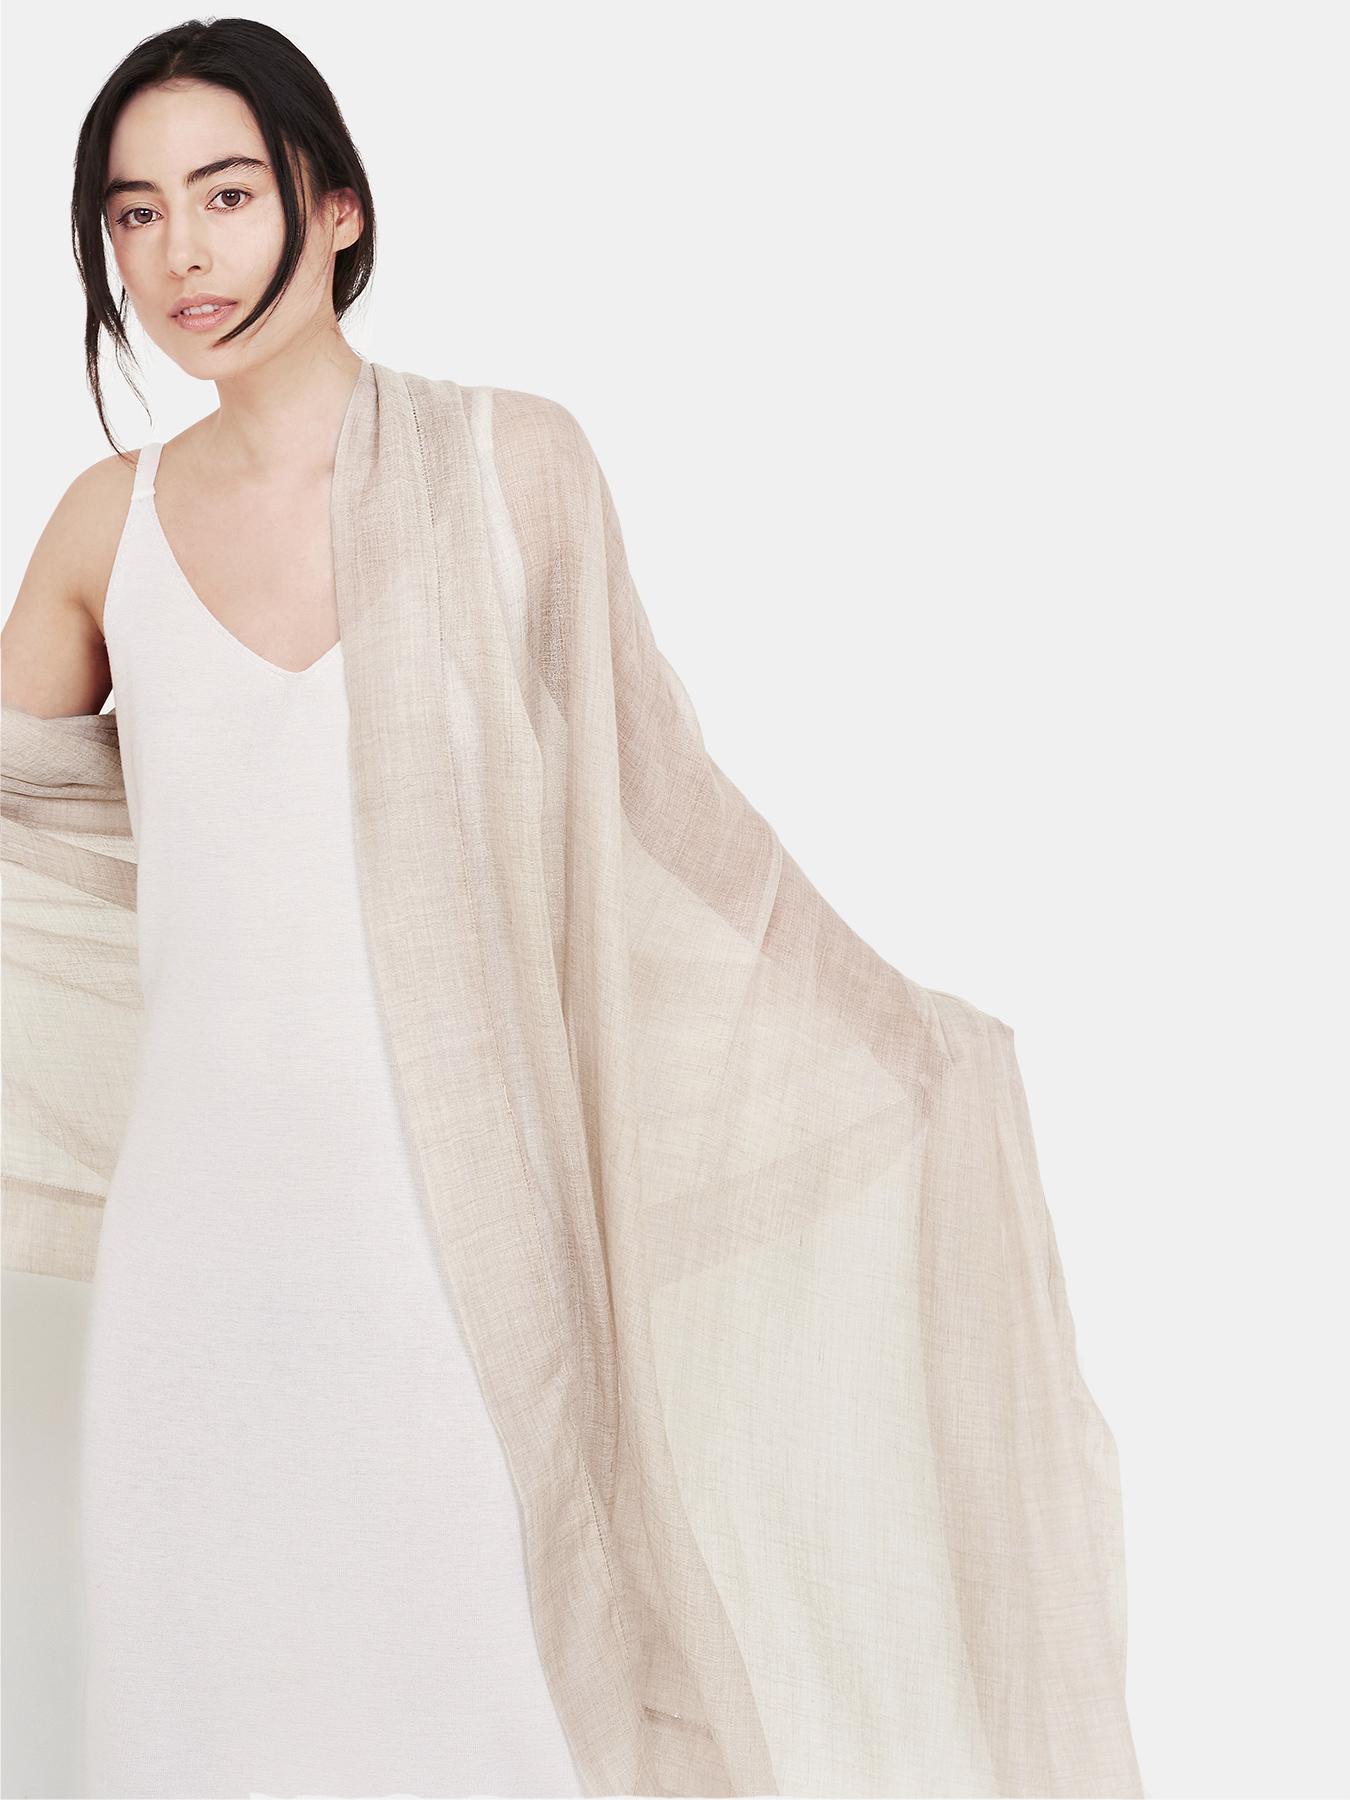 Feather-Cashmere-Wrap-Ecru-c2.jpg